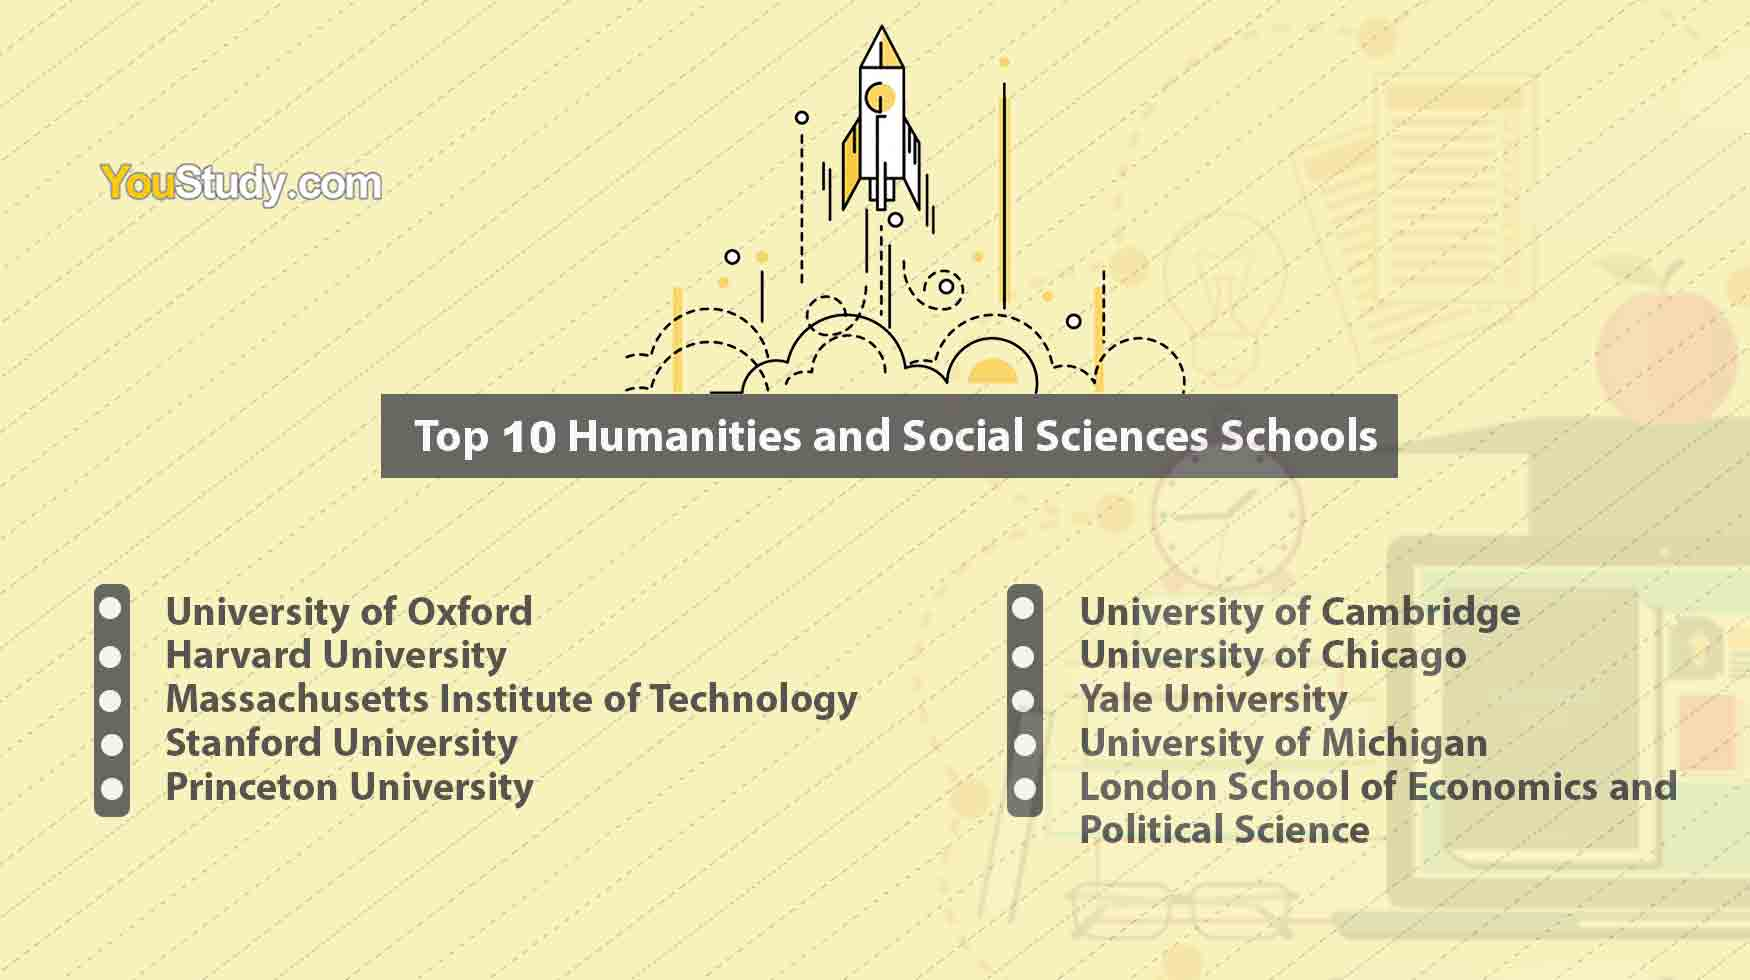 Top 10 Humanities and Social Sciences Schools